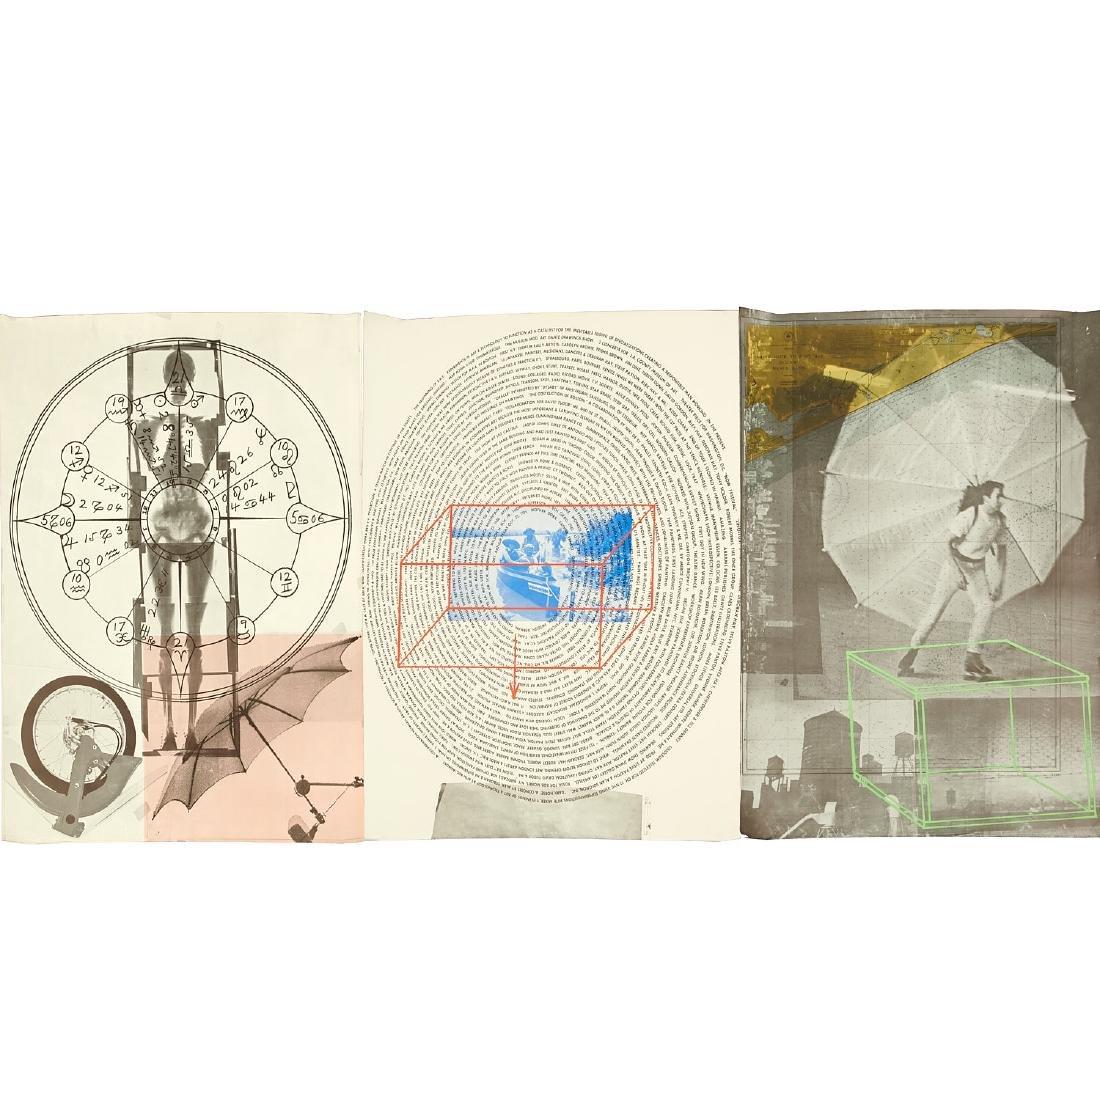 Robert Rauschenberg, triptych print